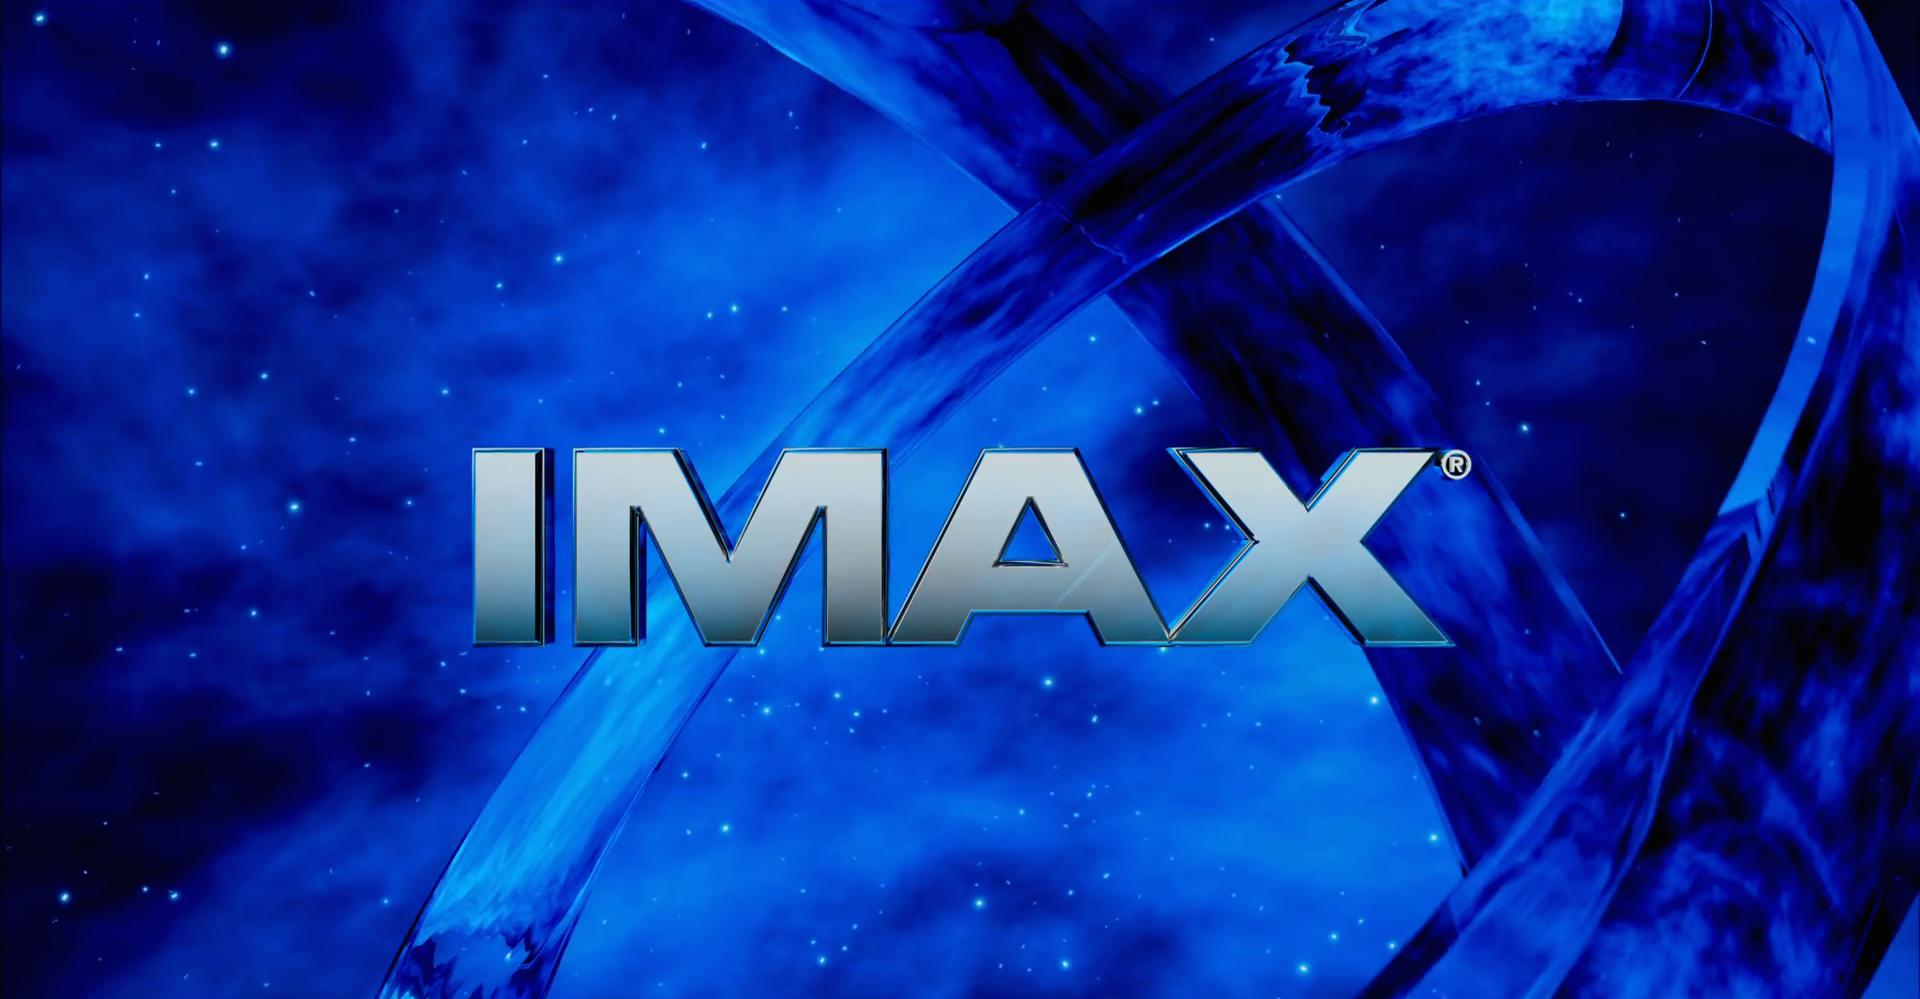 Imax Buy On The Drop Imax Corporation Nyseimax Seeking Alpha